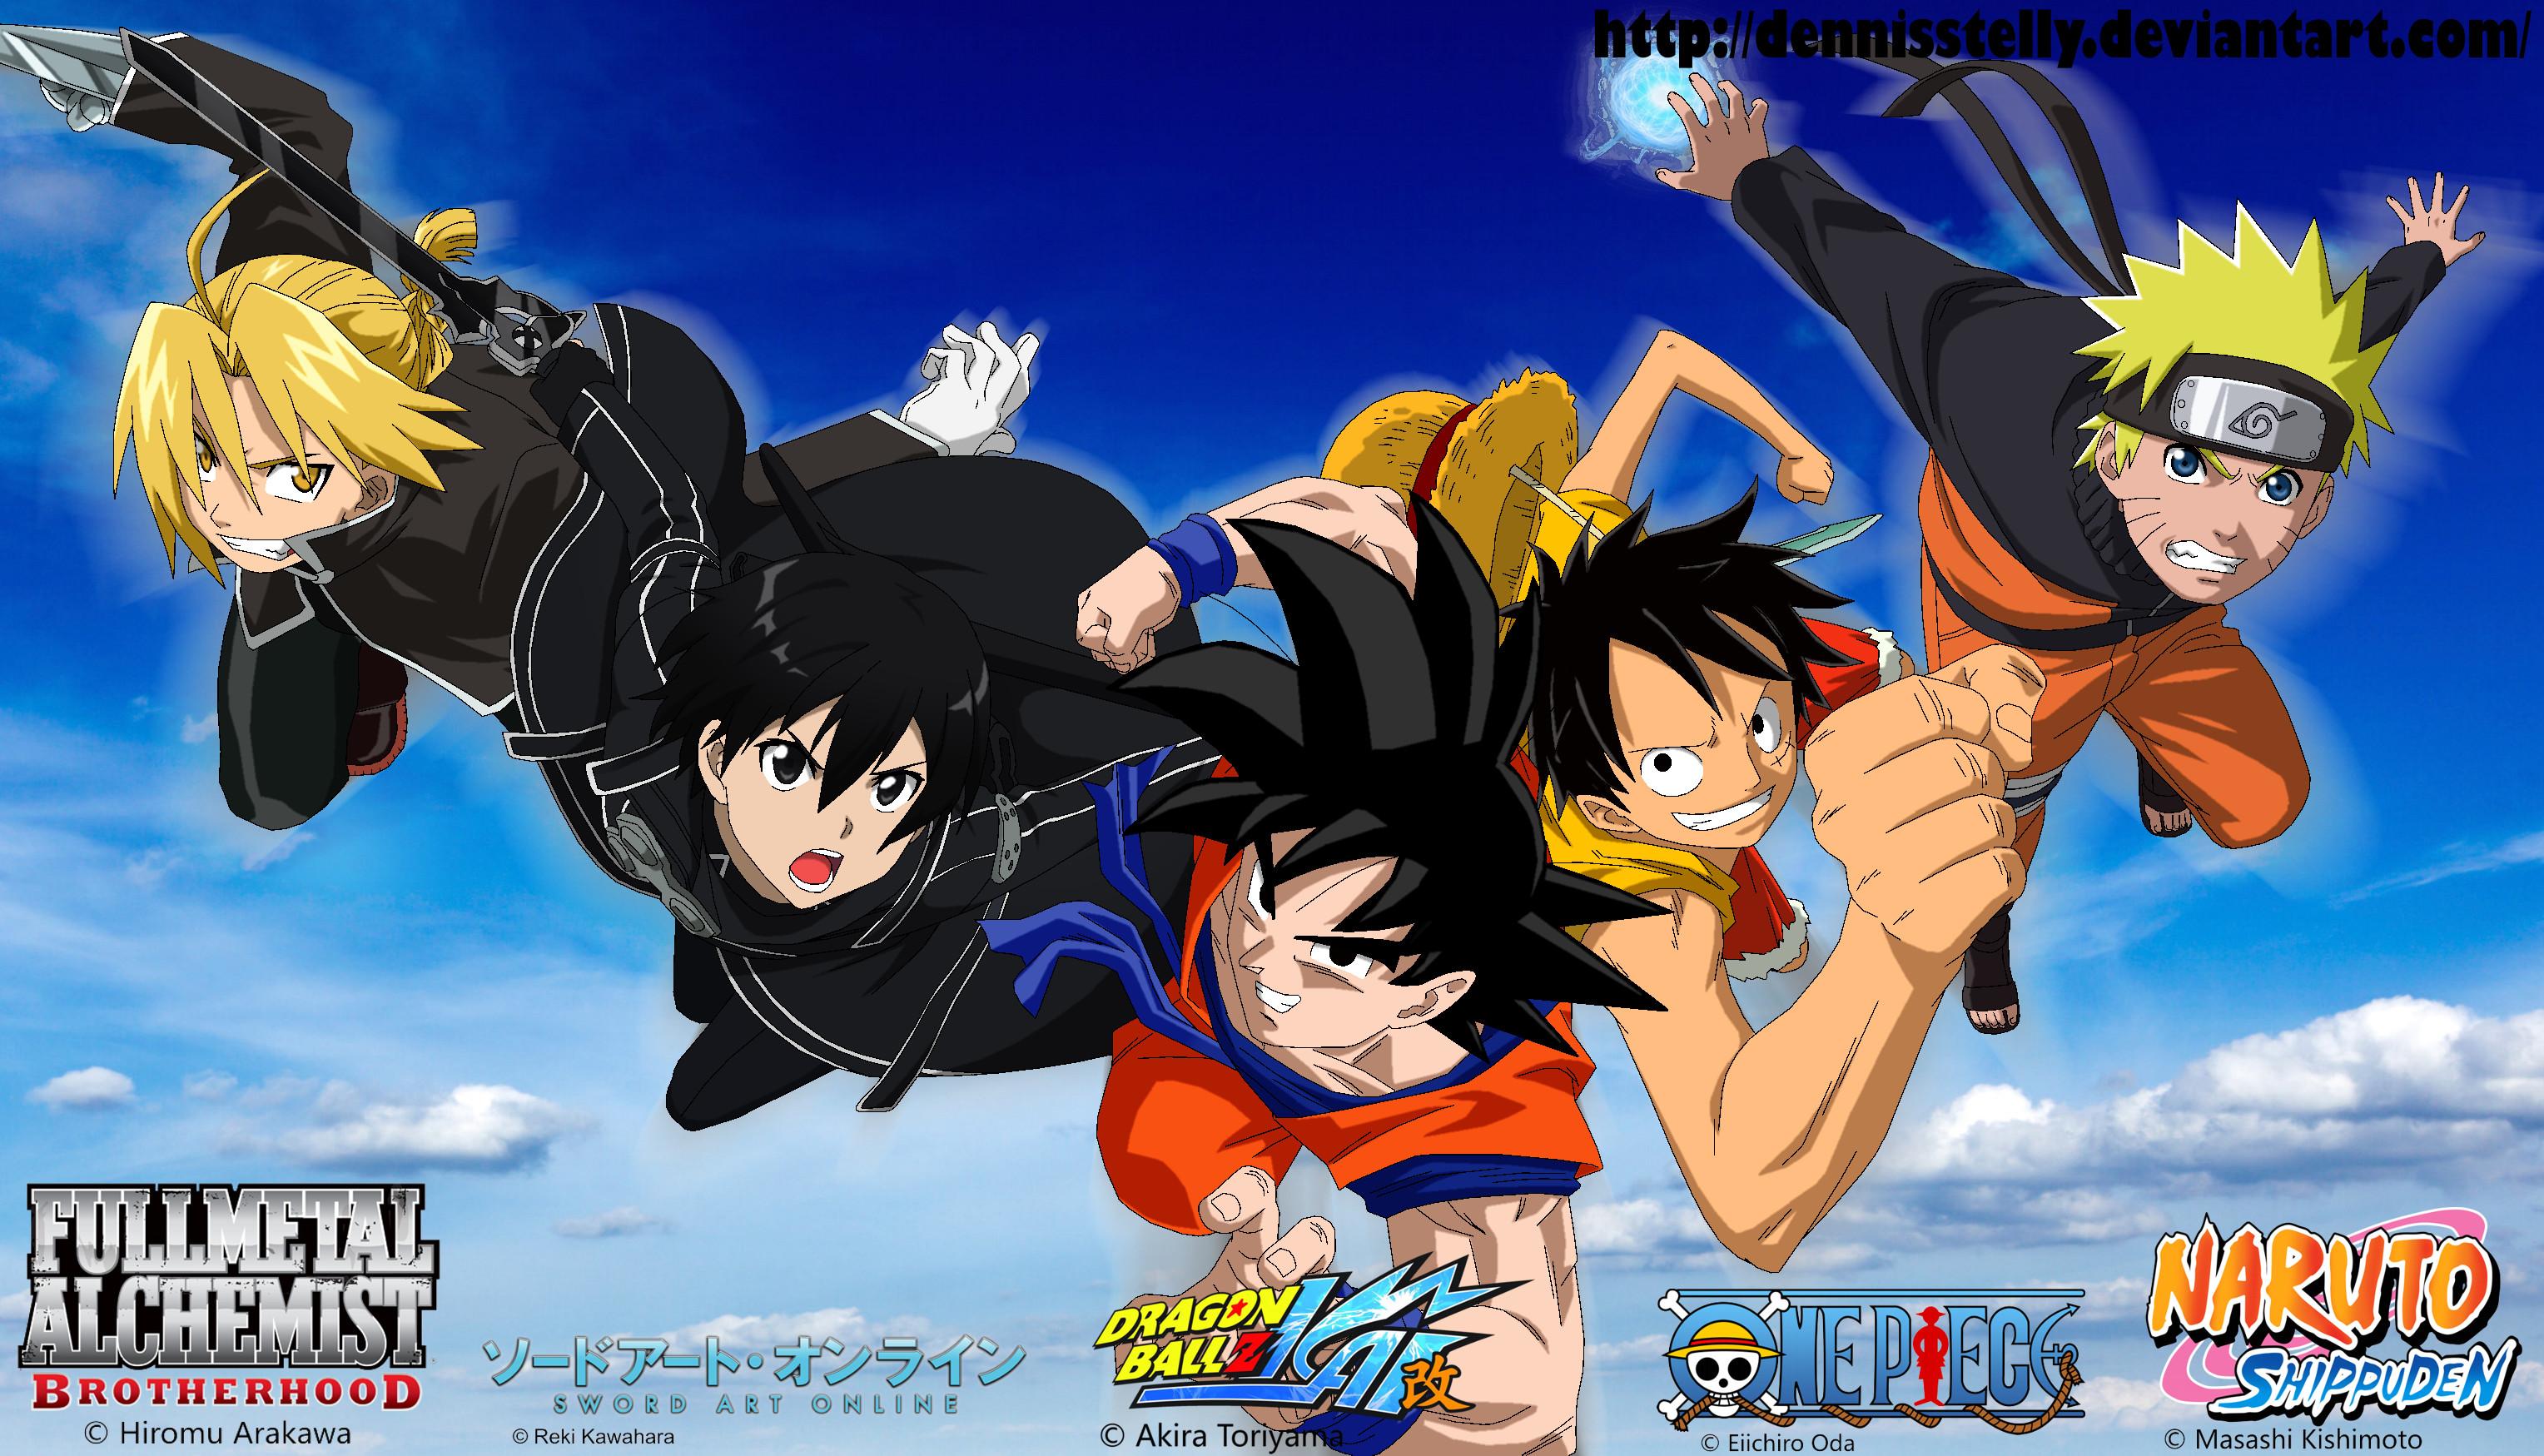 Naruto and Goku Wallpaper (74+ images)